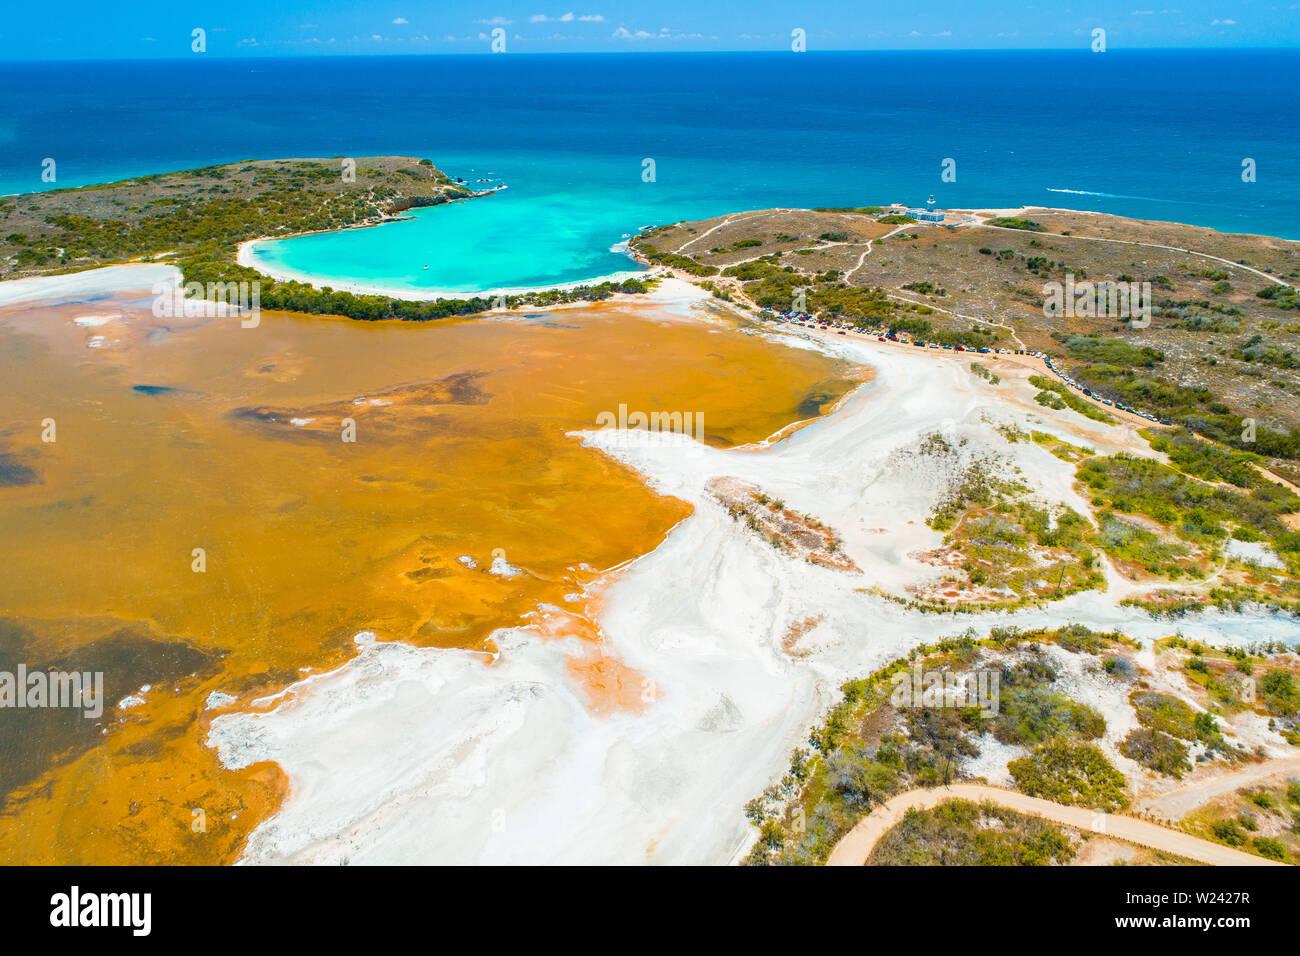 Vue aérienne de Puerto Rico. Faro Los Morrillos de Cabo Rojo. Playa Sucia beach et lacs de sel à Punta Jaguey. Banque D'Images